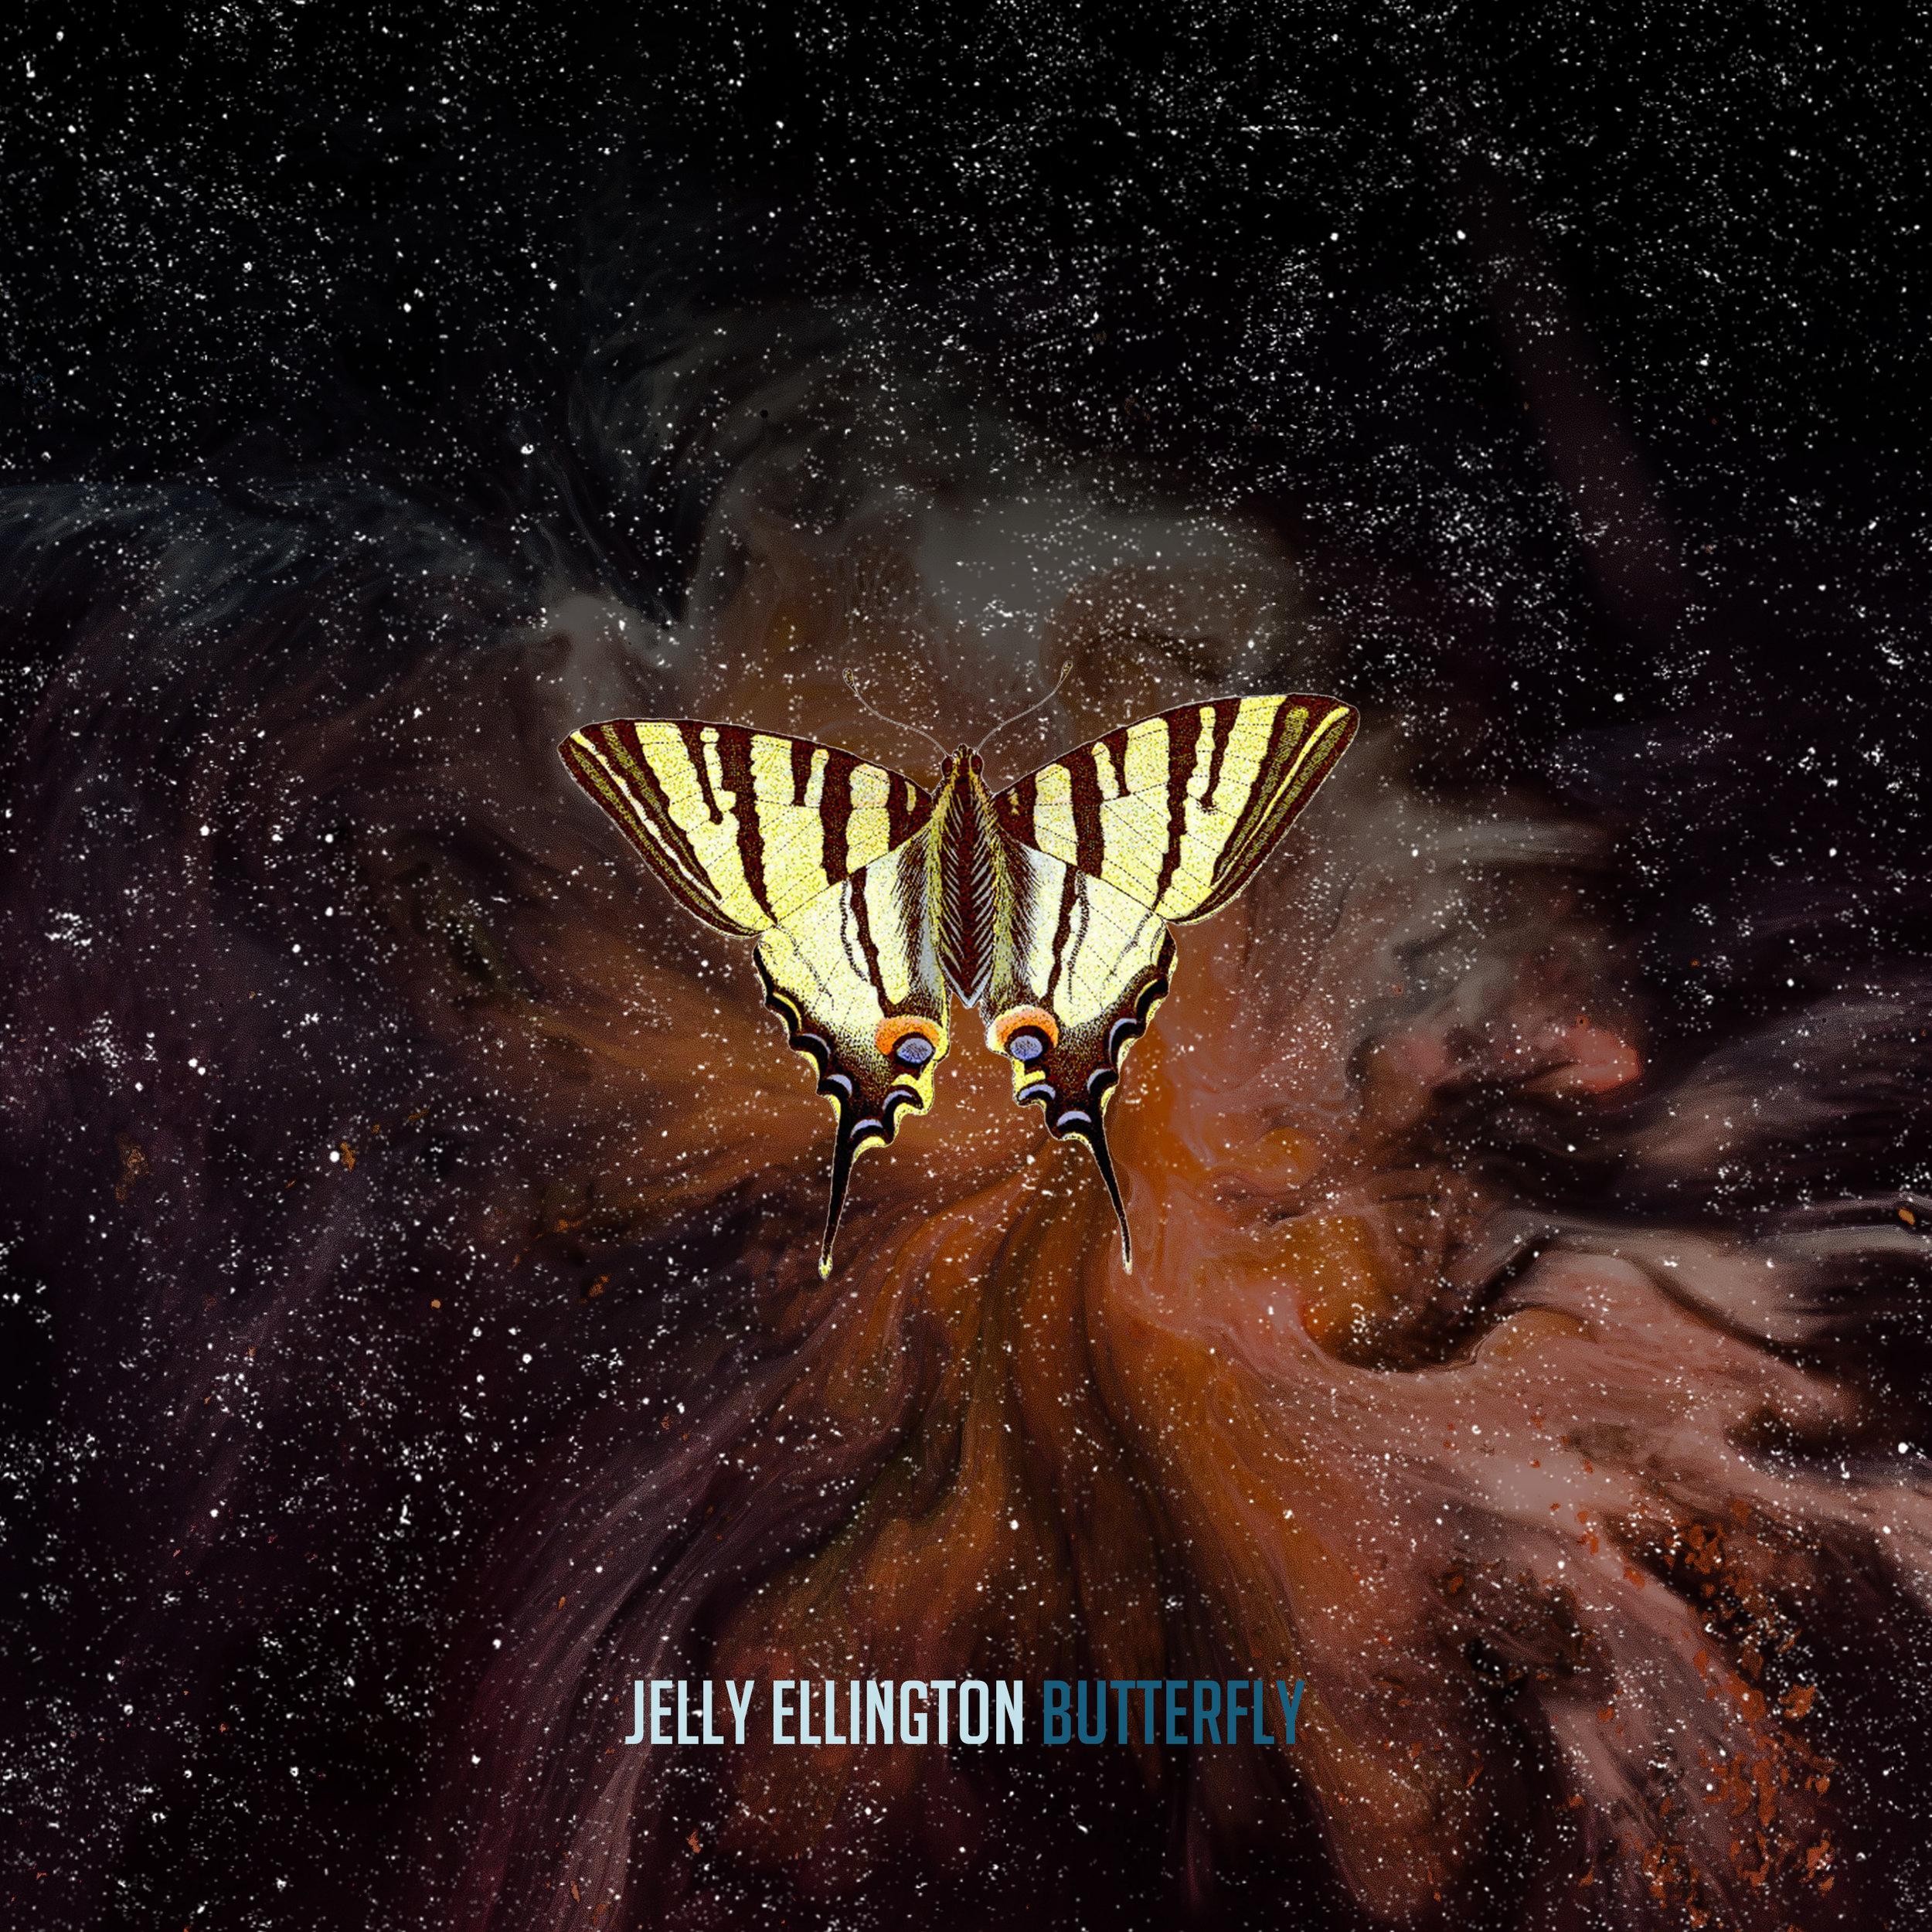 jellyellington_butterfly.jpg